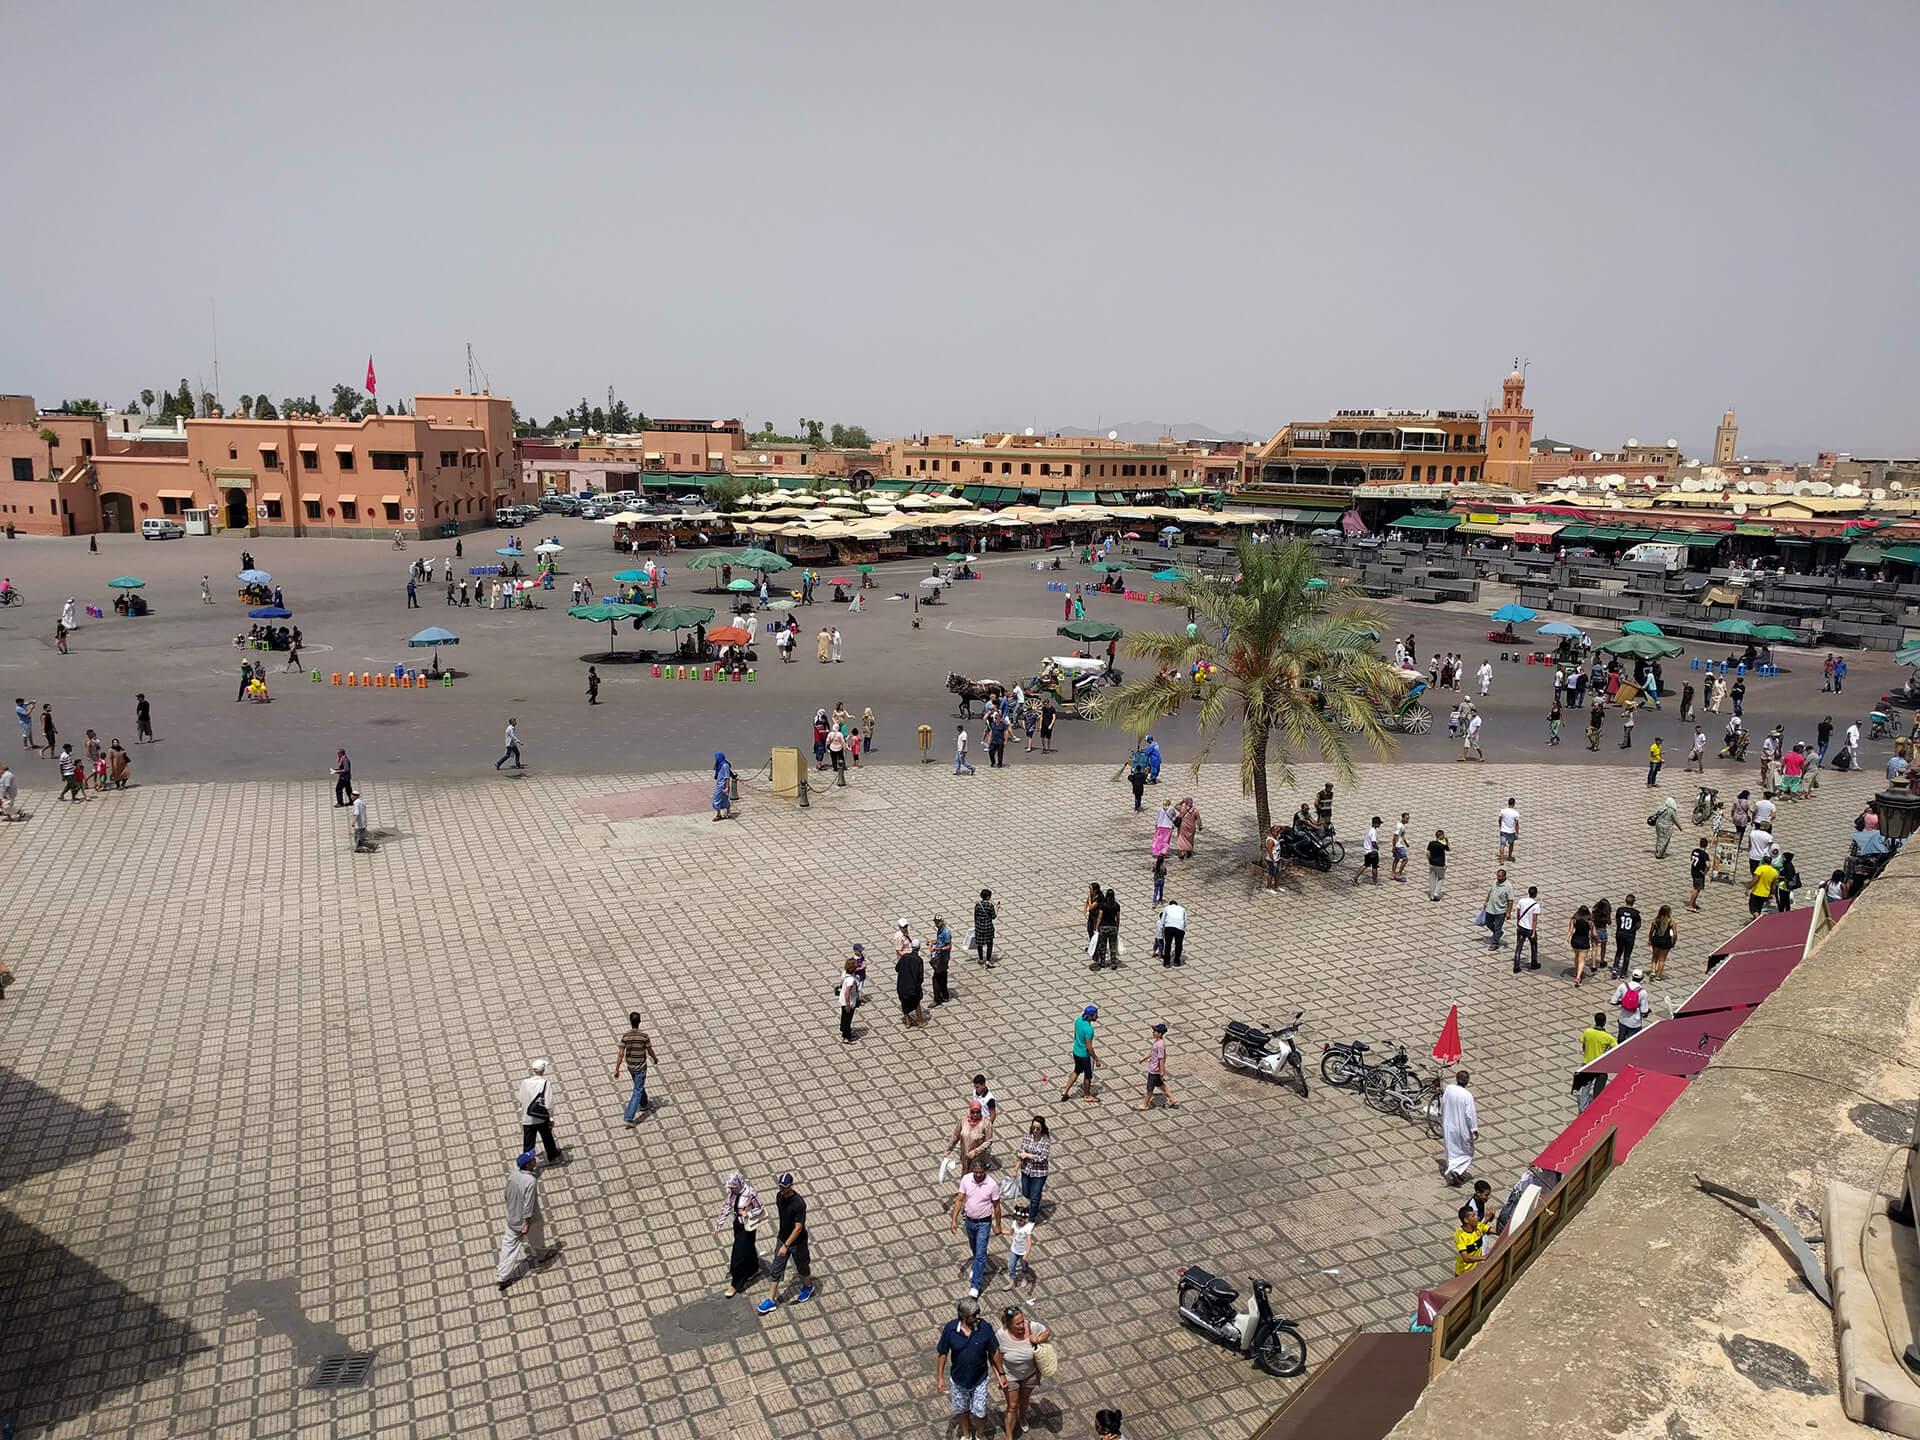 Slika trga Džema el Fna u Marakešu